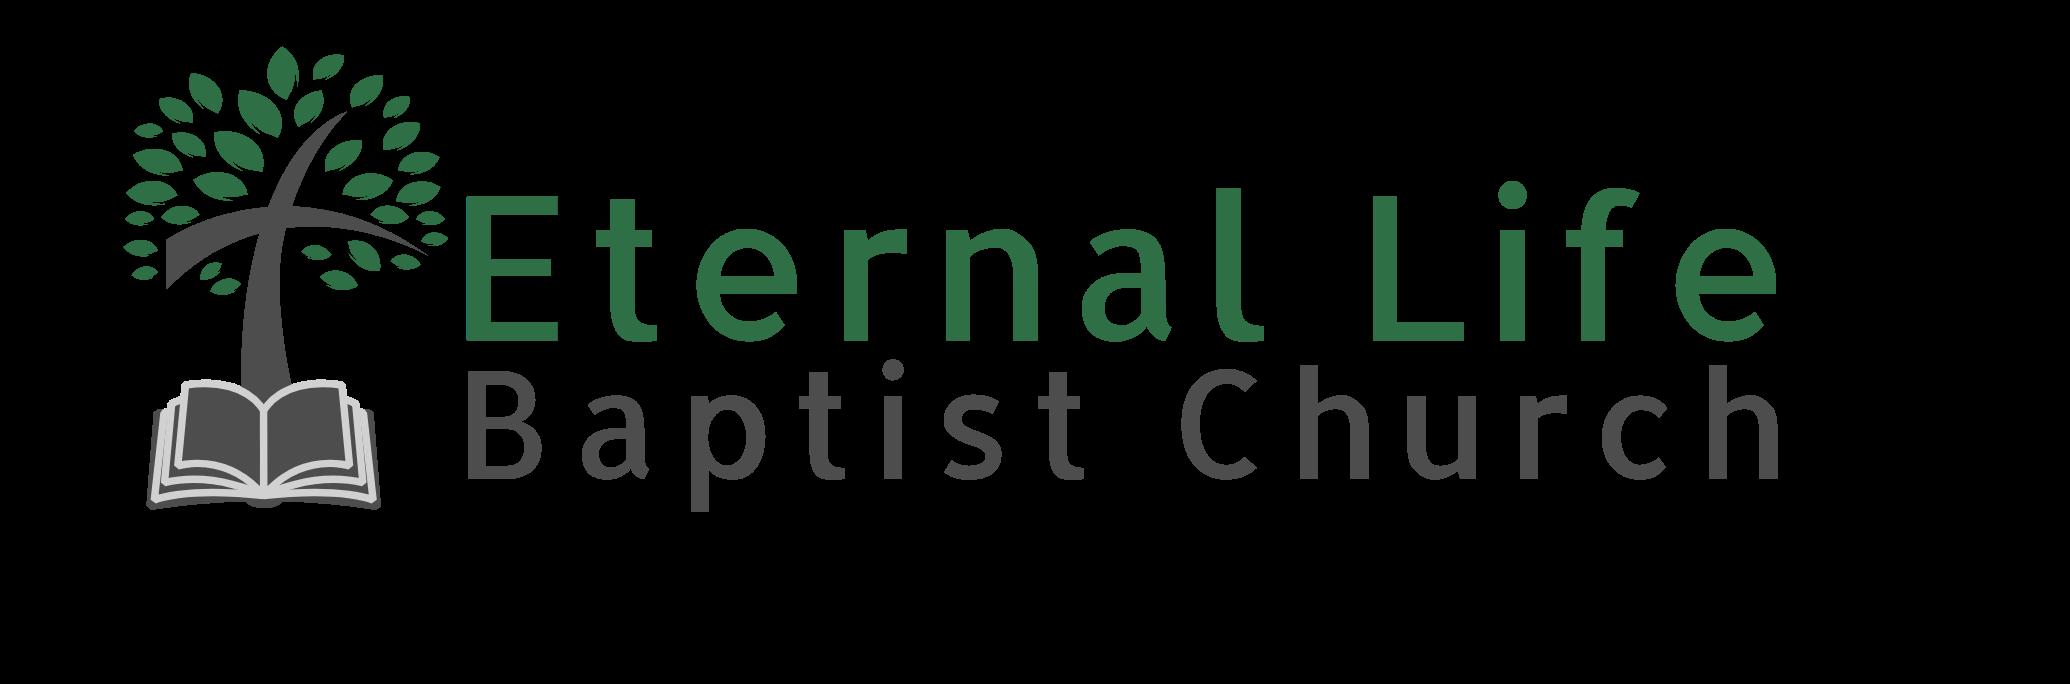 Eternal Life Baptist Church